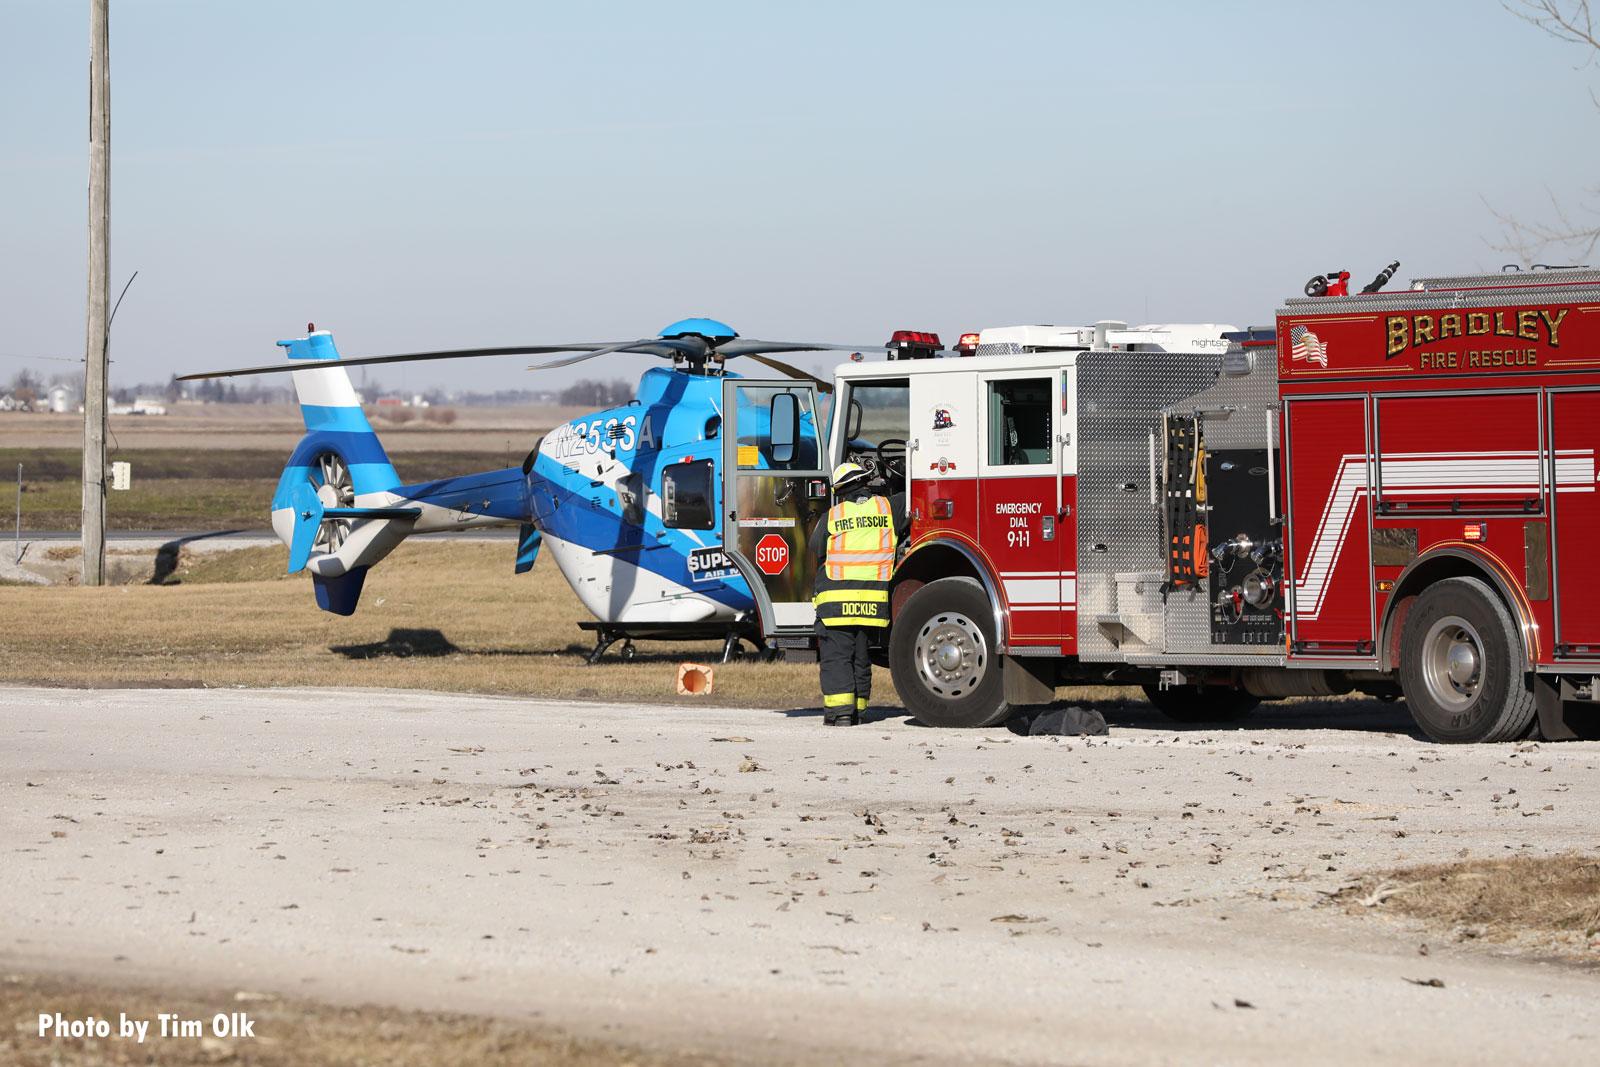 A chopper and fire apparatus